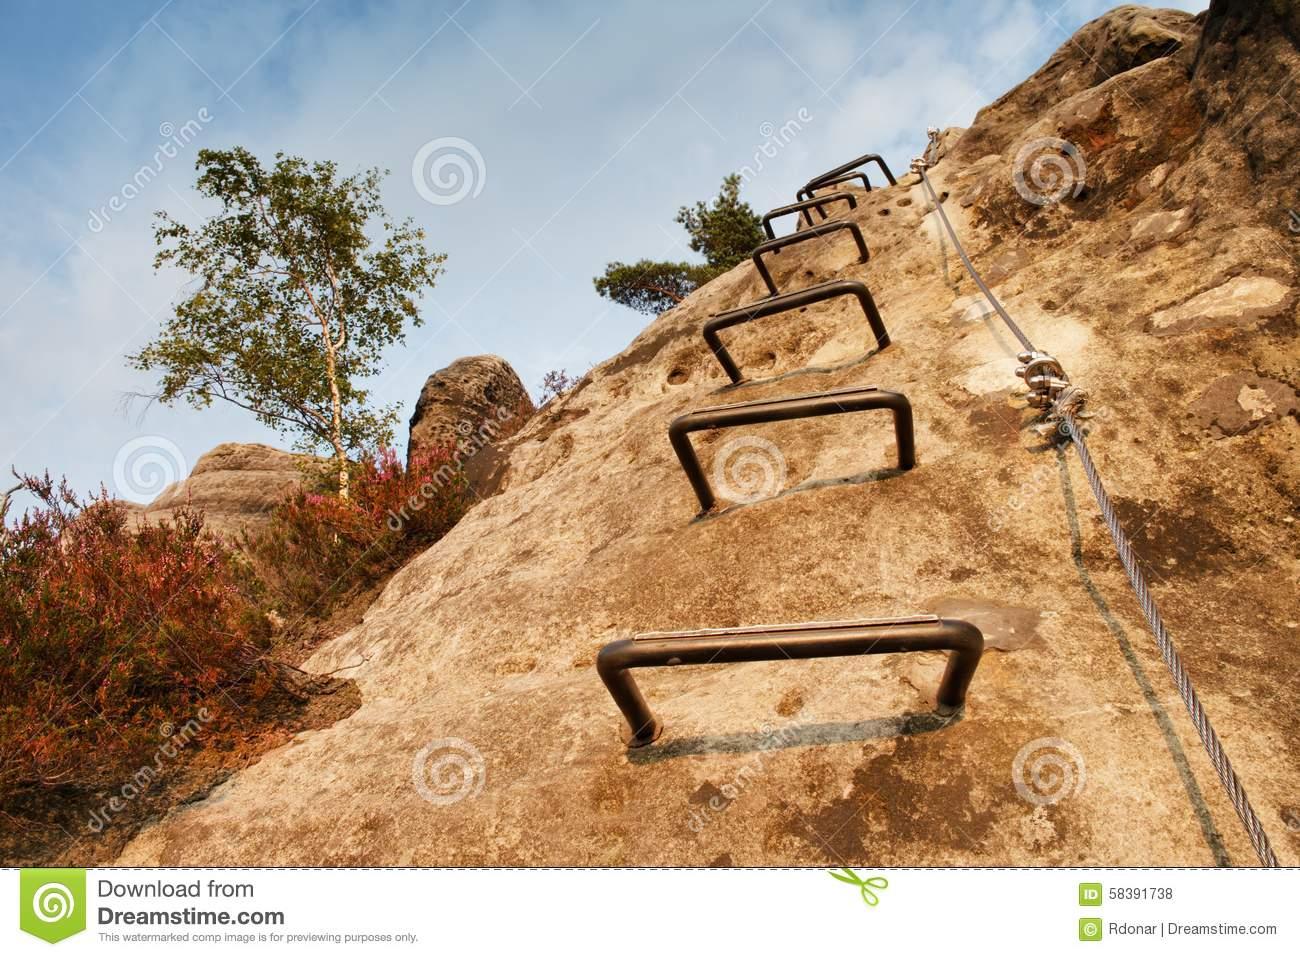 Climbers Metal Ladder Via Ferrata. Iron Twisted Rope Fixed In.